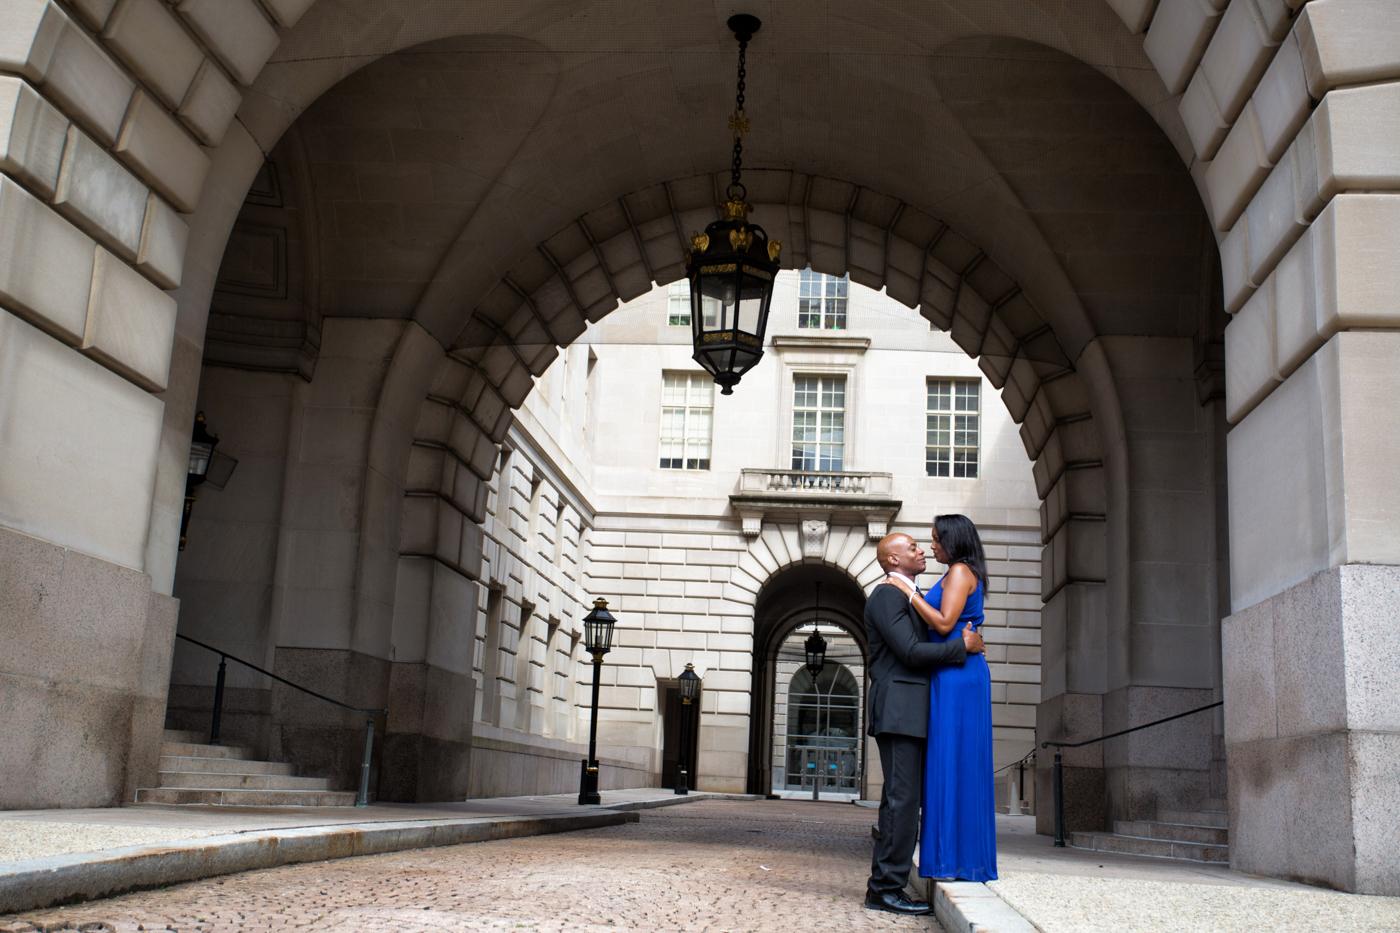 wedding-anniversary-photo-shoot-in-washington-dc-ksenia-pro-photography-20